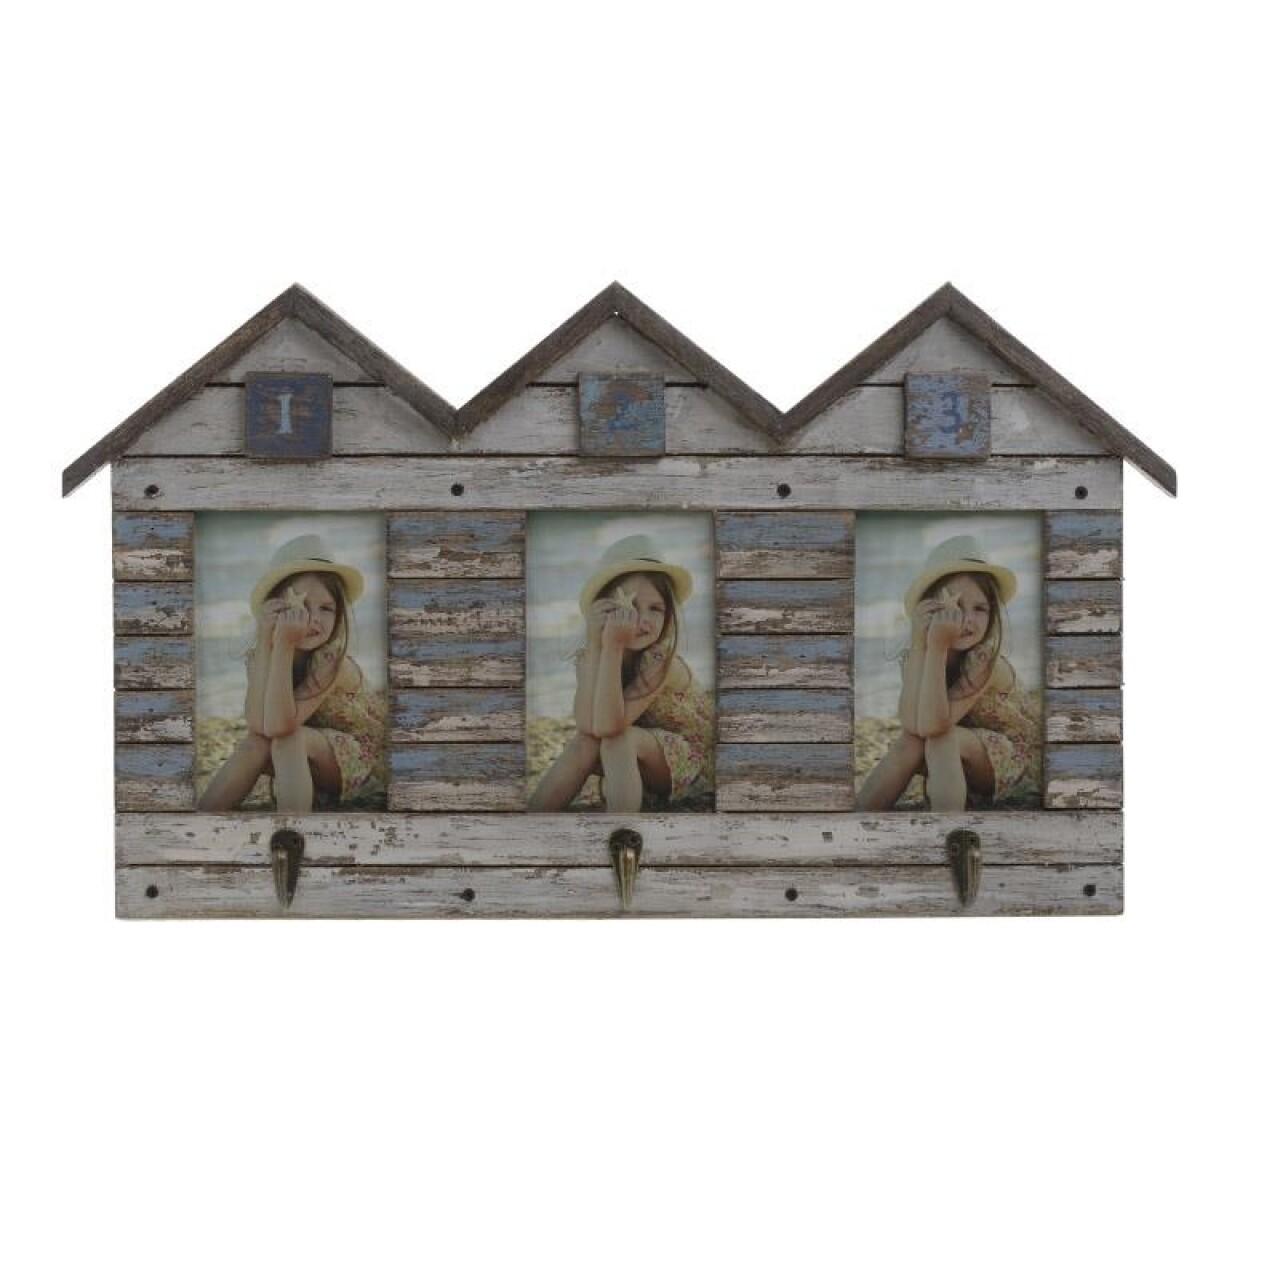 Cuier cu rama foto Trio, InArt, 3 fotografii, 30 x 51 cm, lemn si metal, natur/bleu